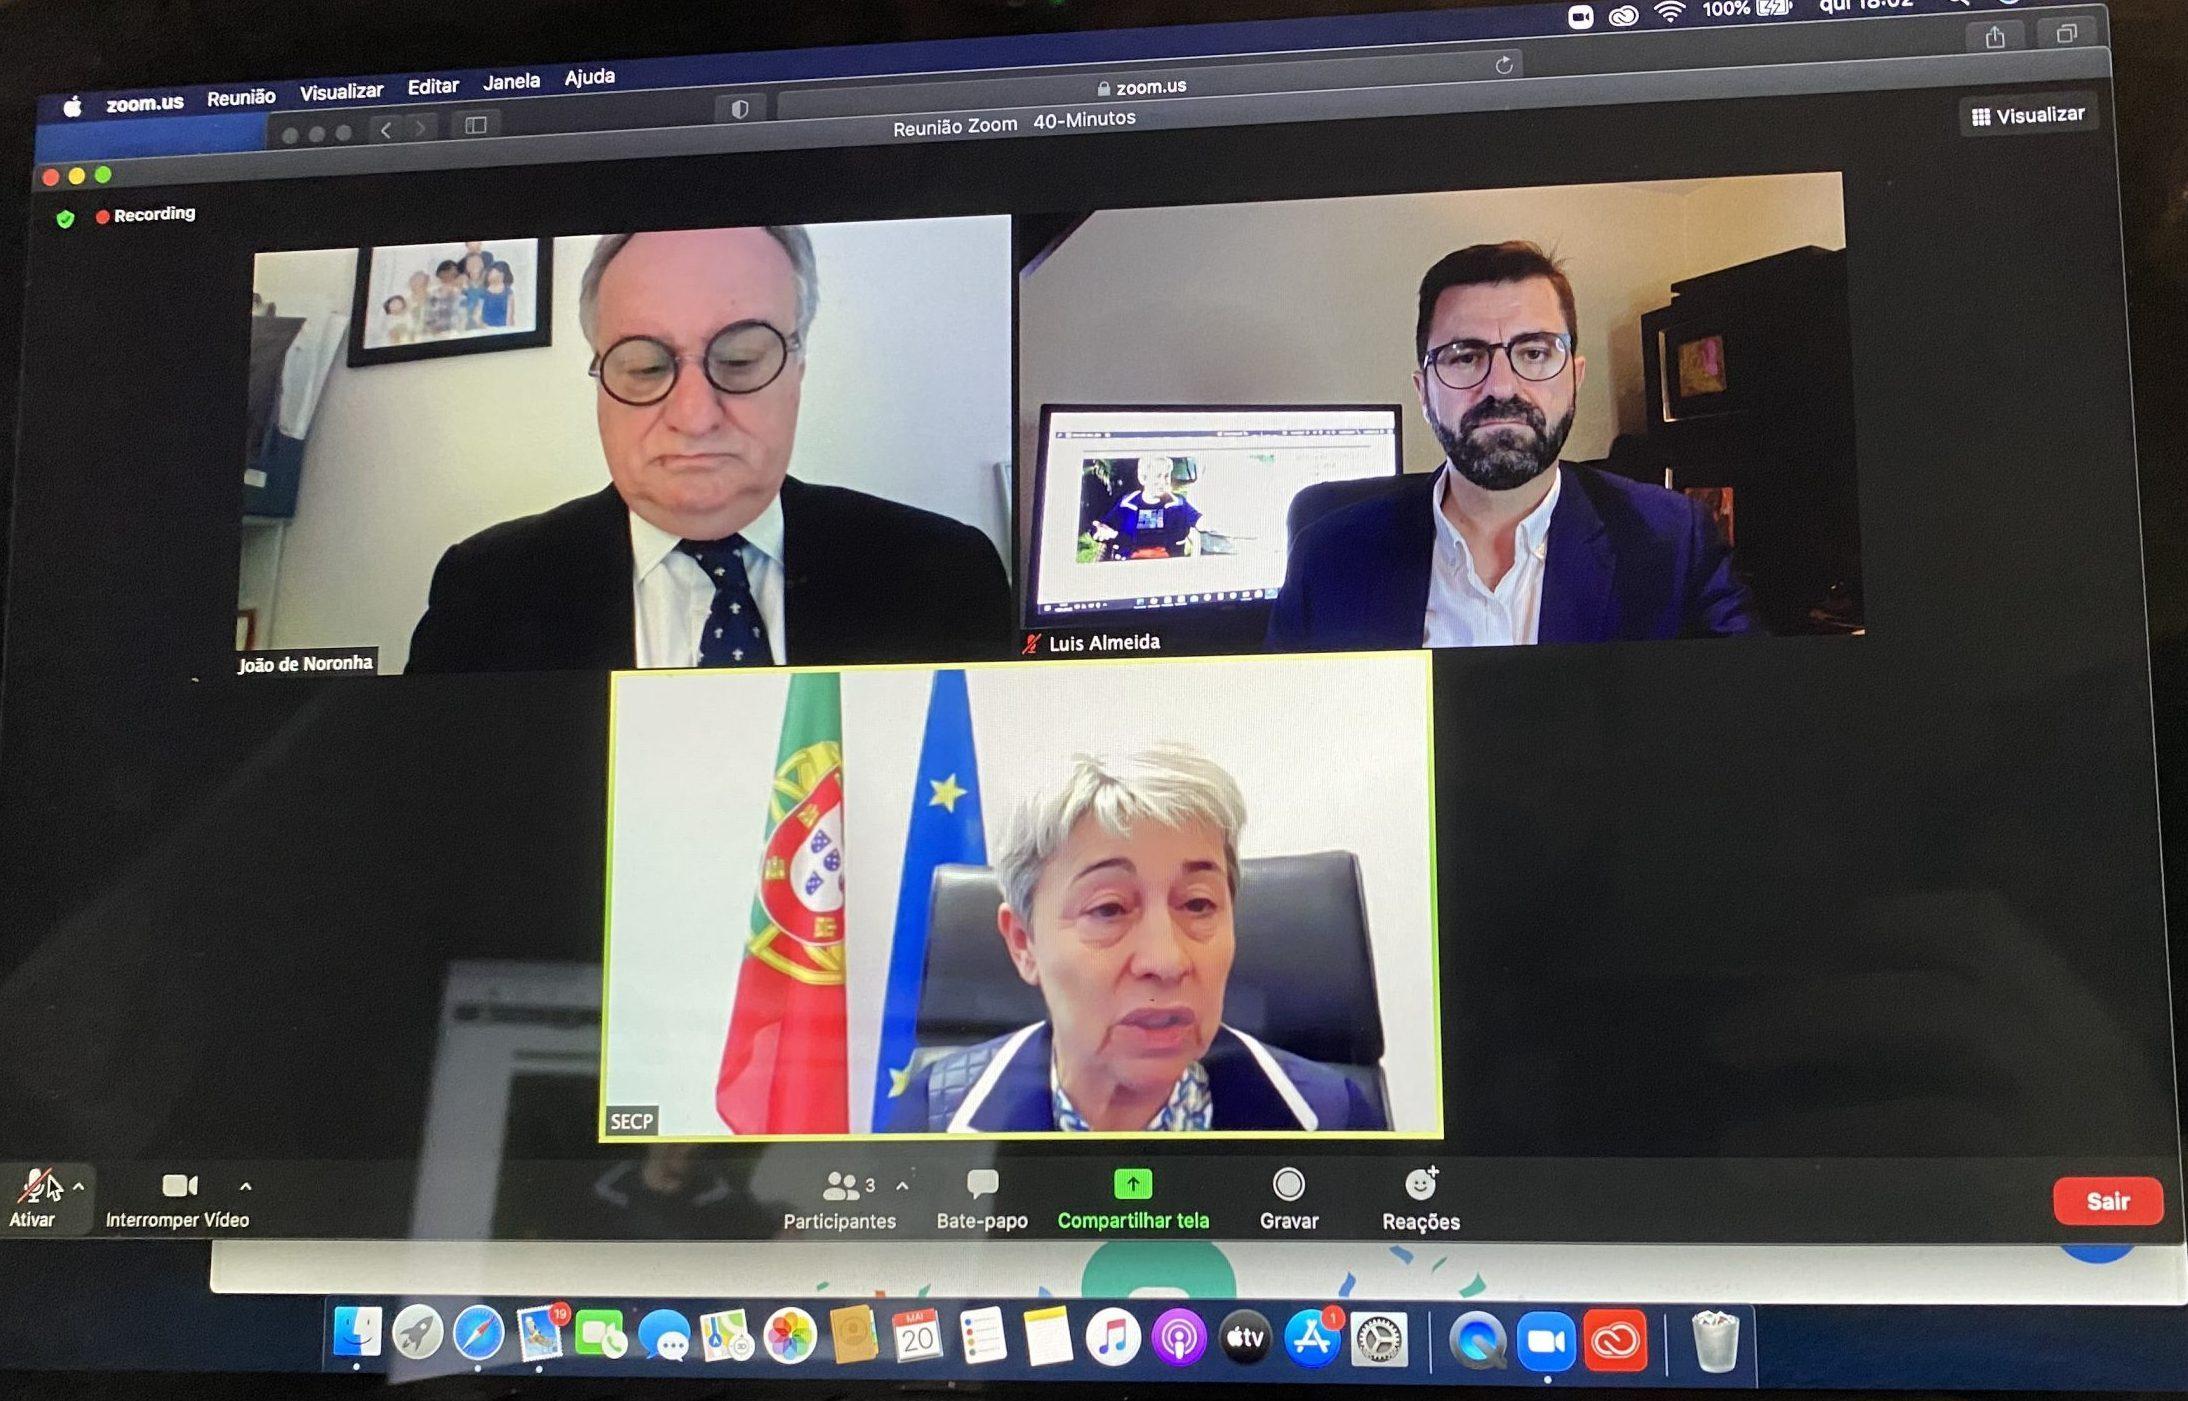 Entrevista com a Dra. Berta Nunes, a actual Secretaria de Estado das Comunidades Portuguesas.